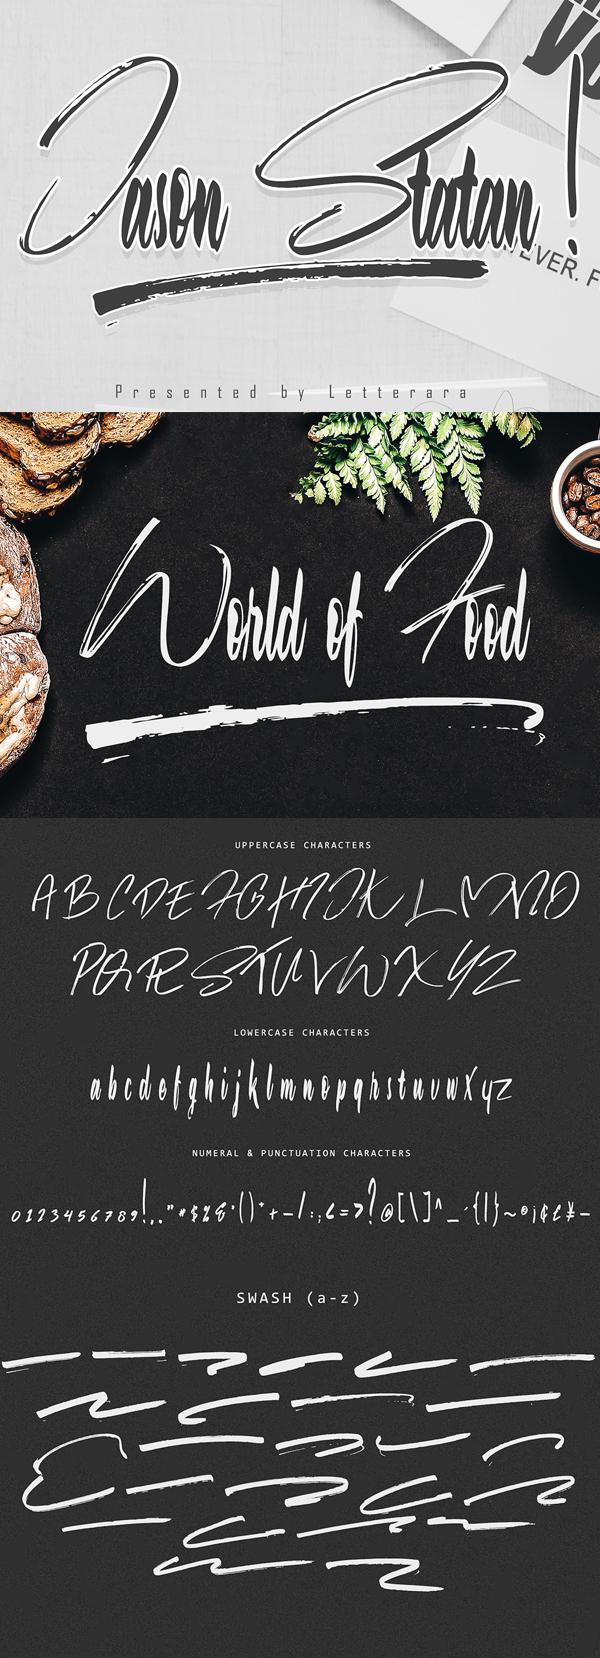 Jason Statan Bold Handwritten Script Free Font - 50 Best Free Brush Fonts